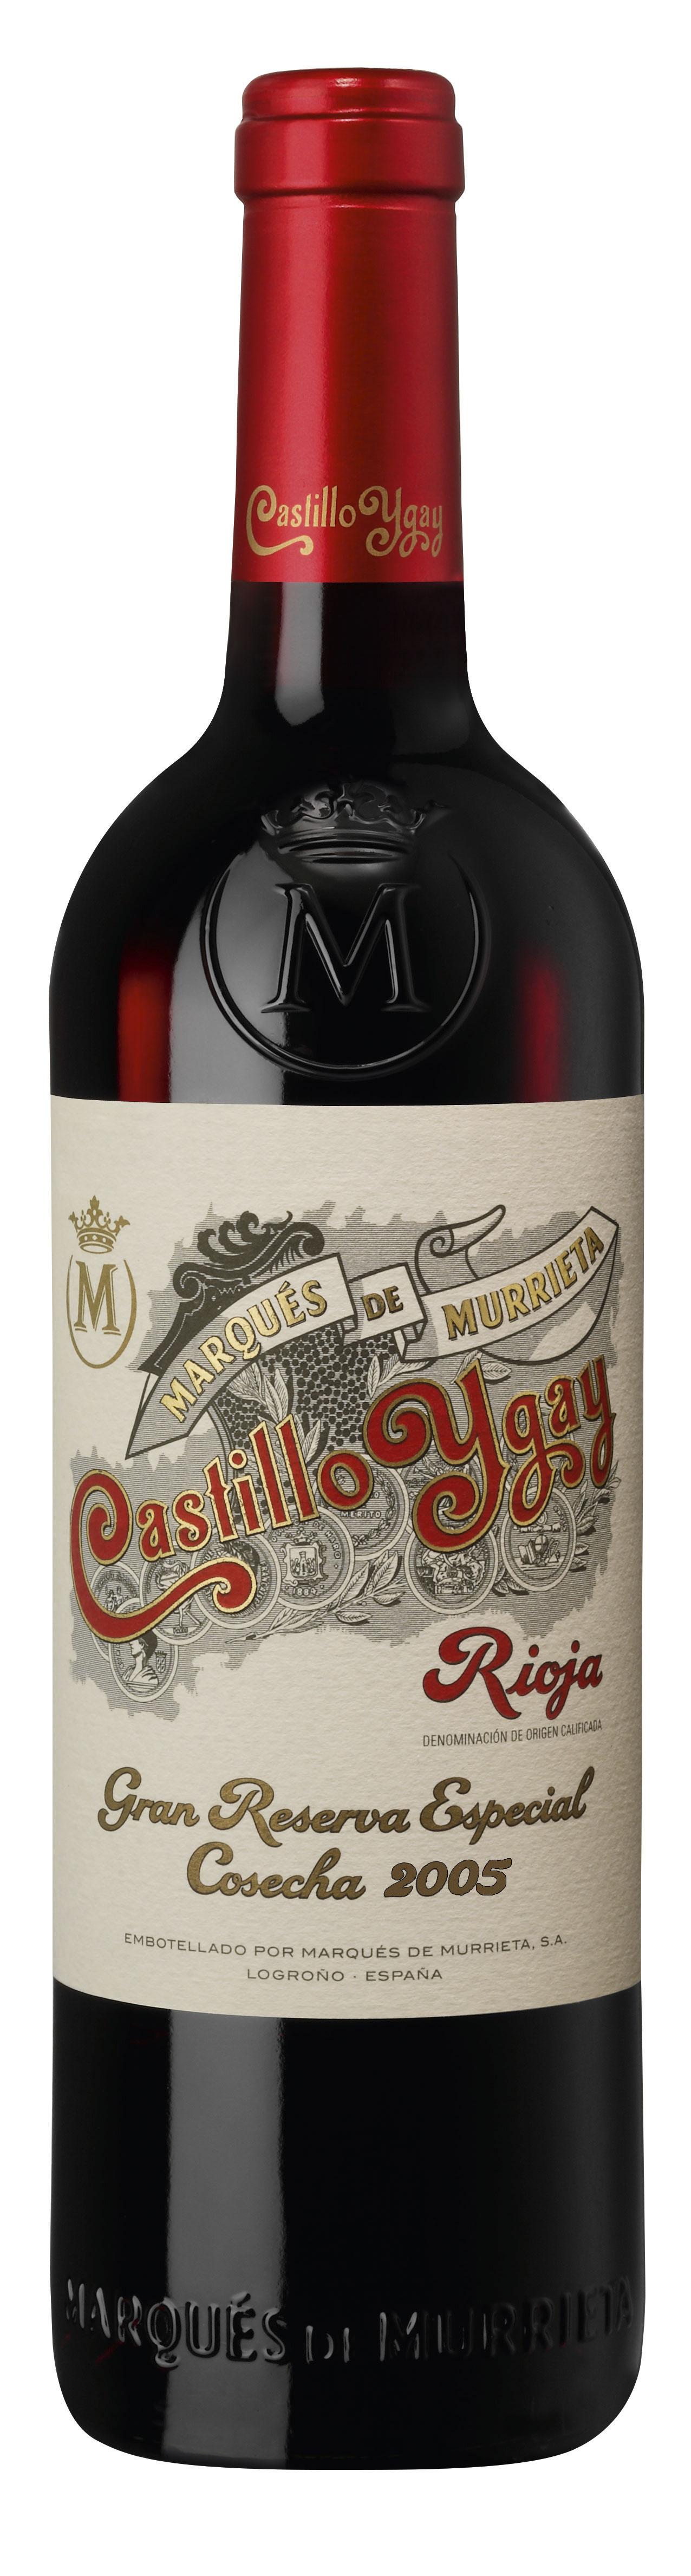 Castillo Ygay Rioja Gran Reserva Especial Magnum 2009